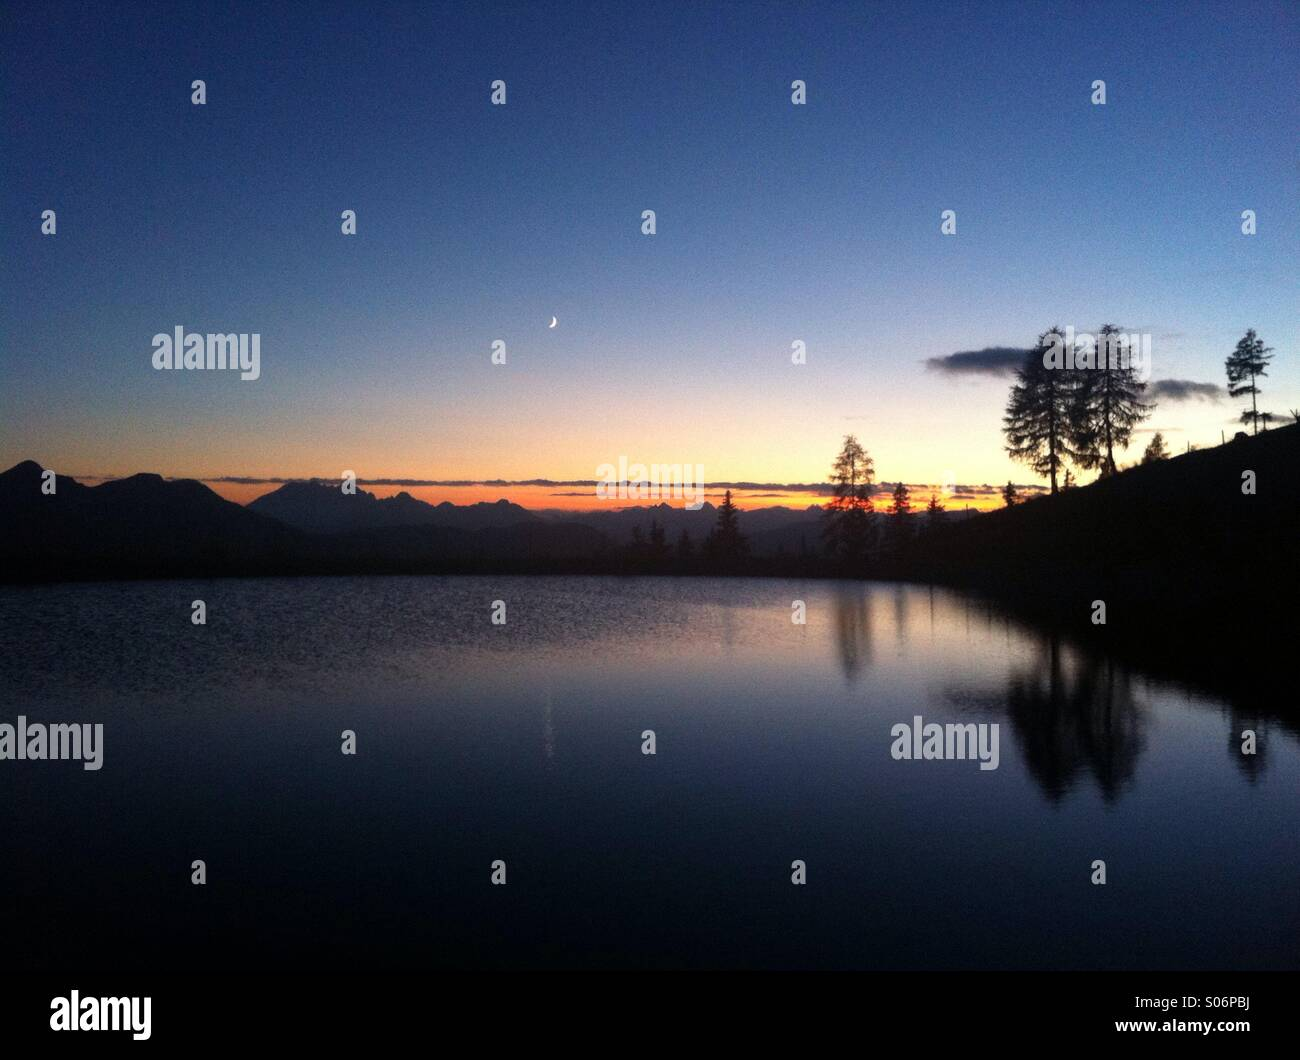 Mountain-Lake-Sunset-Reflection-With-Moo